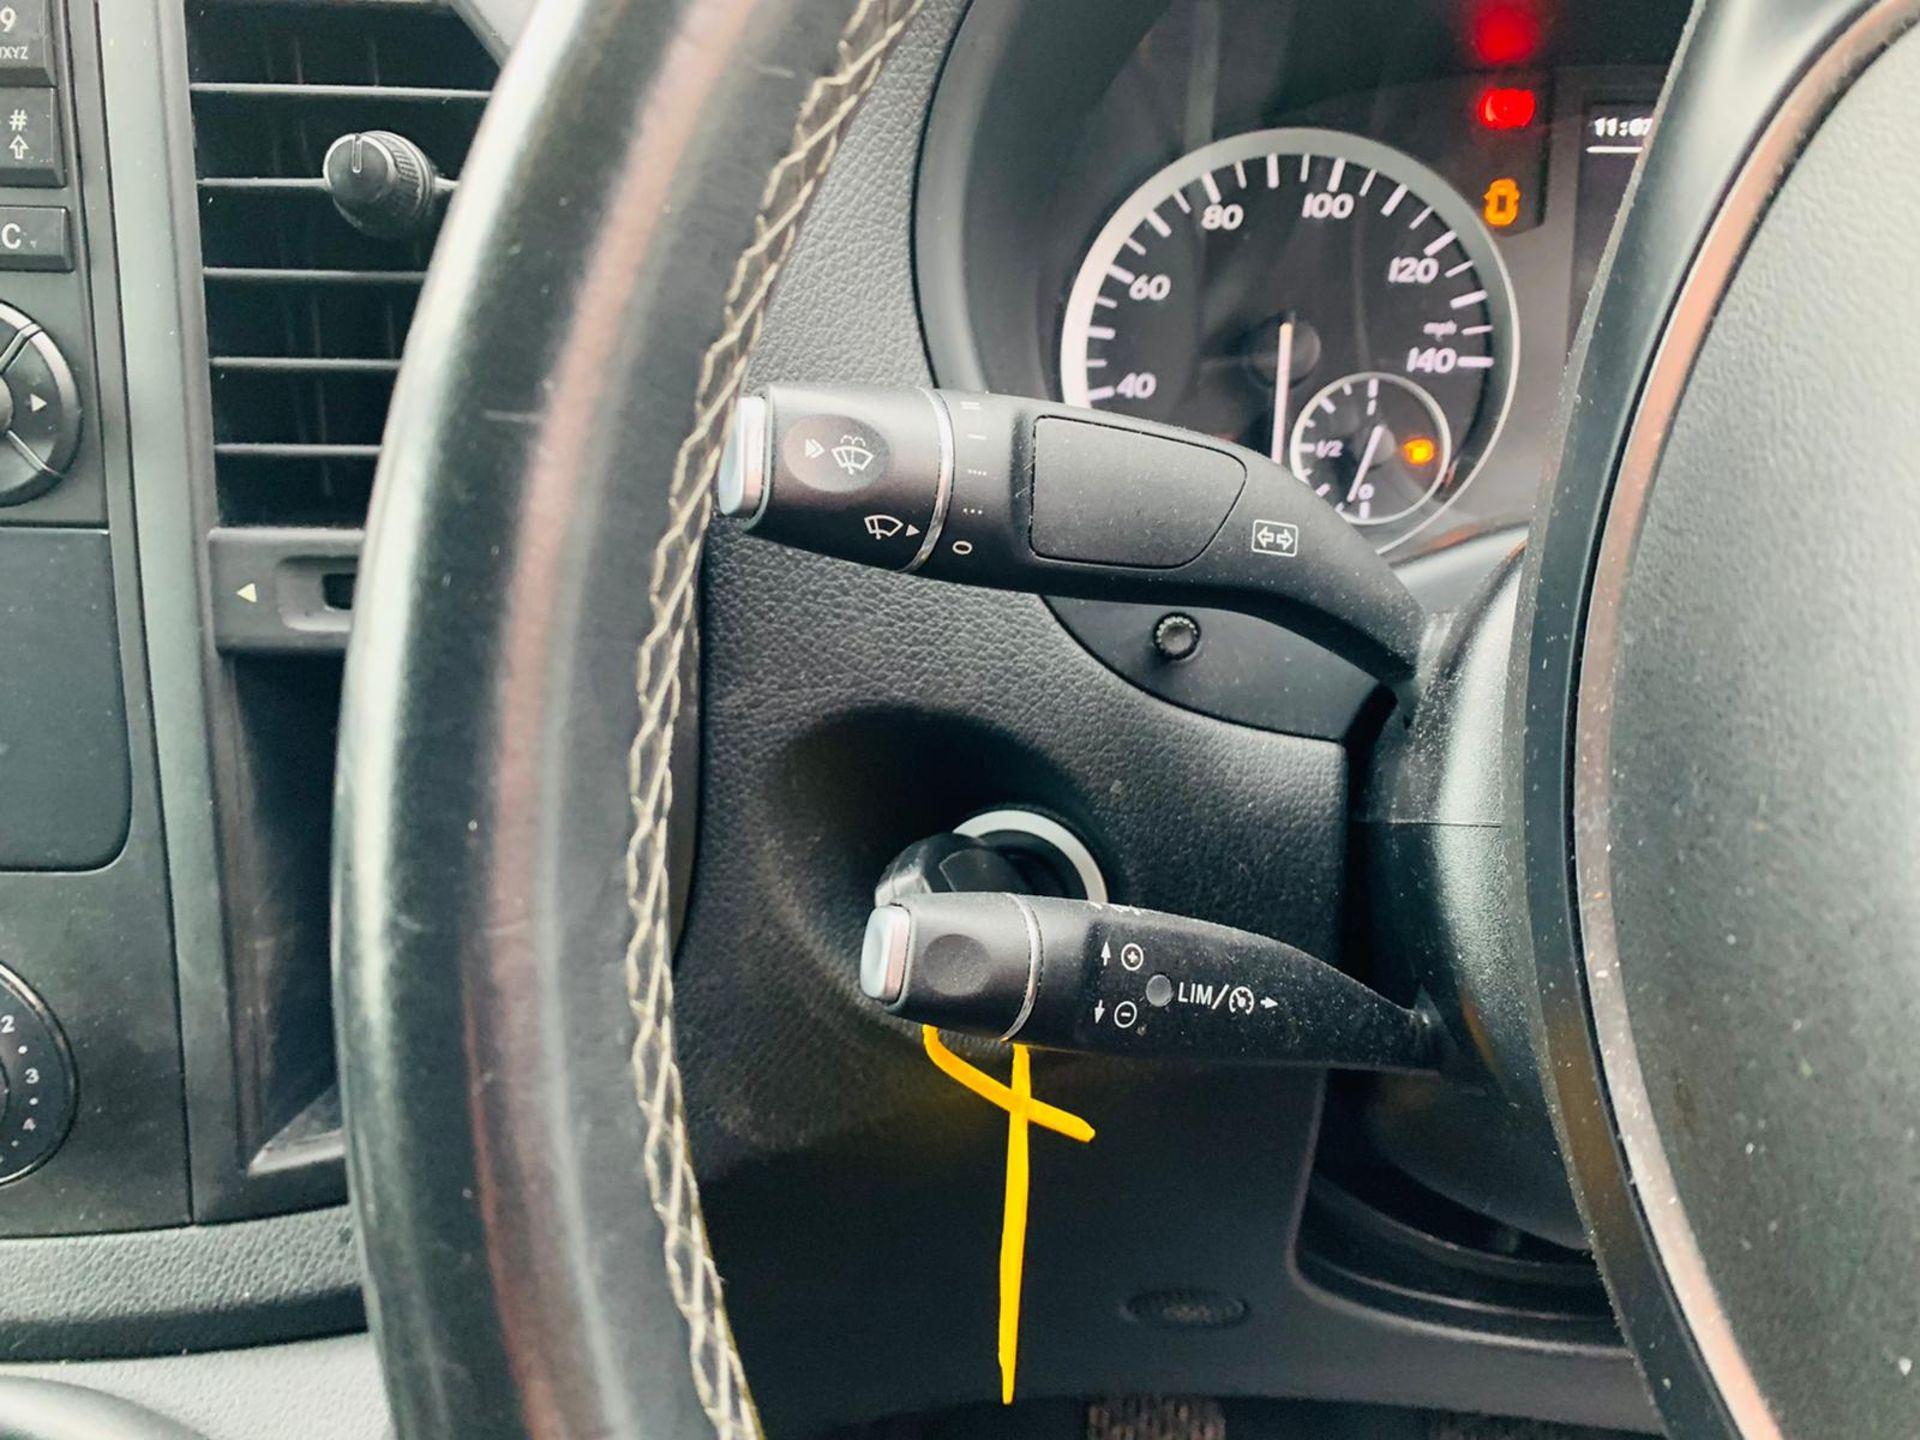 (RESERVE MET) Mercedes Vito 116Cdi Sporty Spec (161 BHP) Bluetech 6 Speed Van - 2016 Model - AC - Image 23 of 28